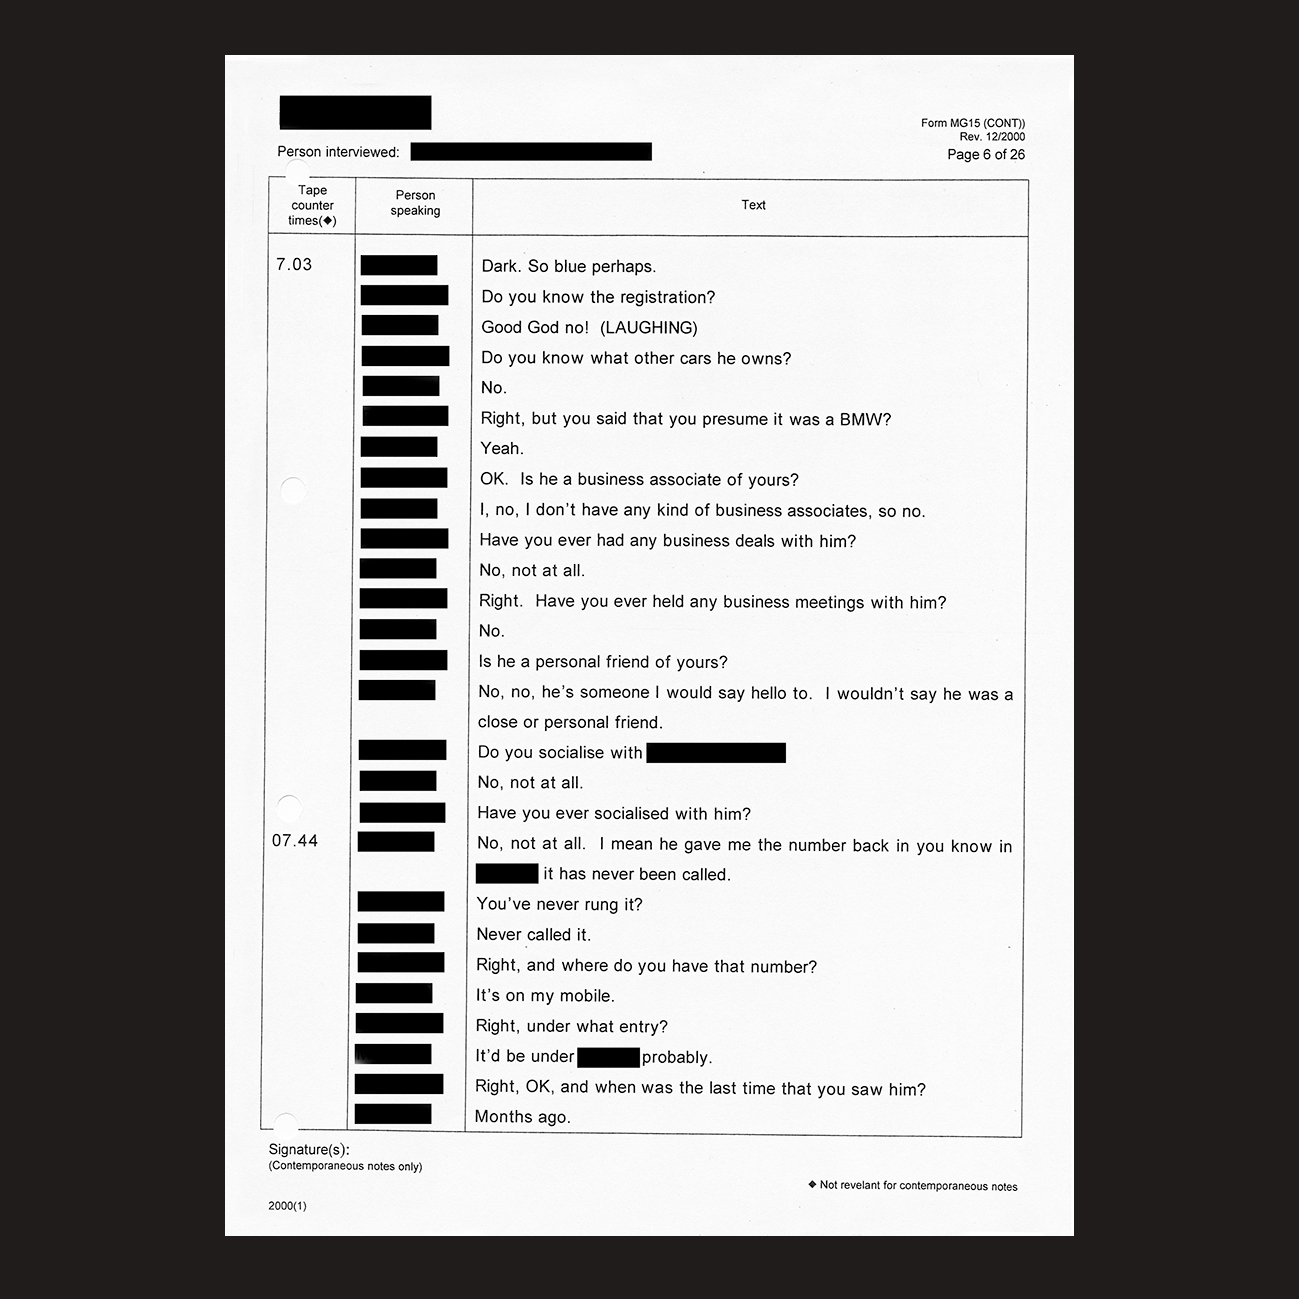 JM Bail 149 - Interview 11 - Telephone Number.jpg